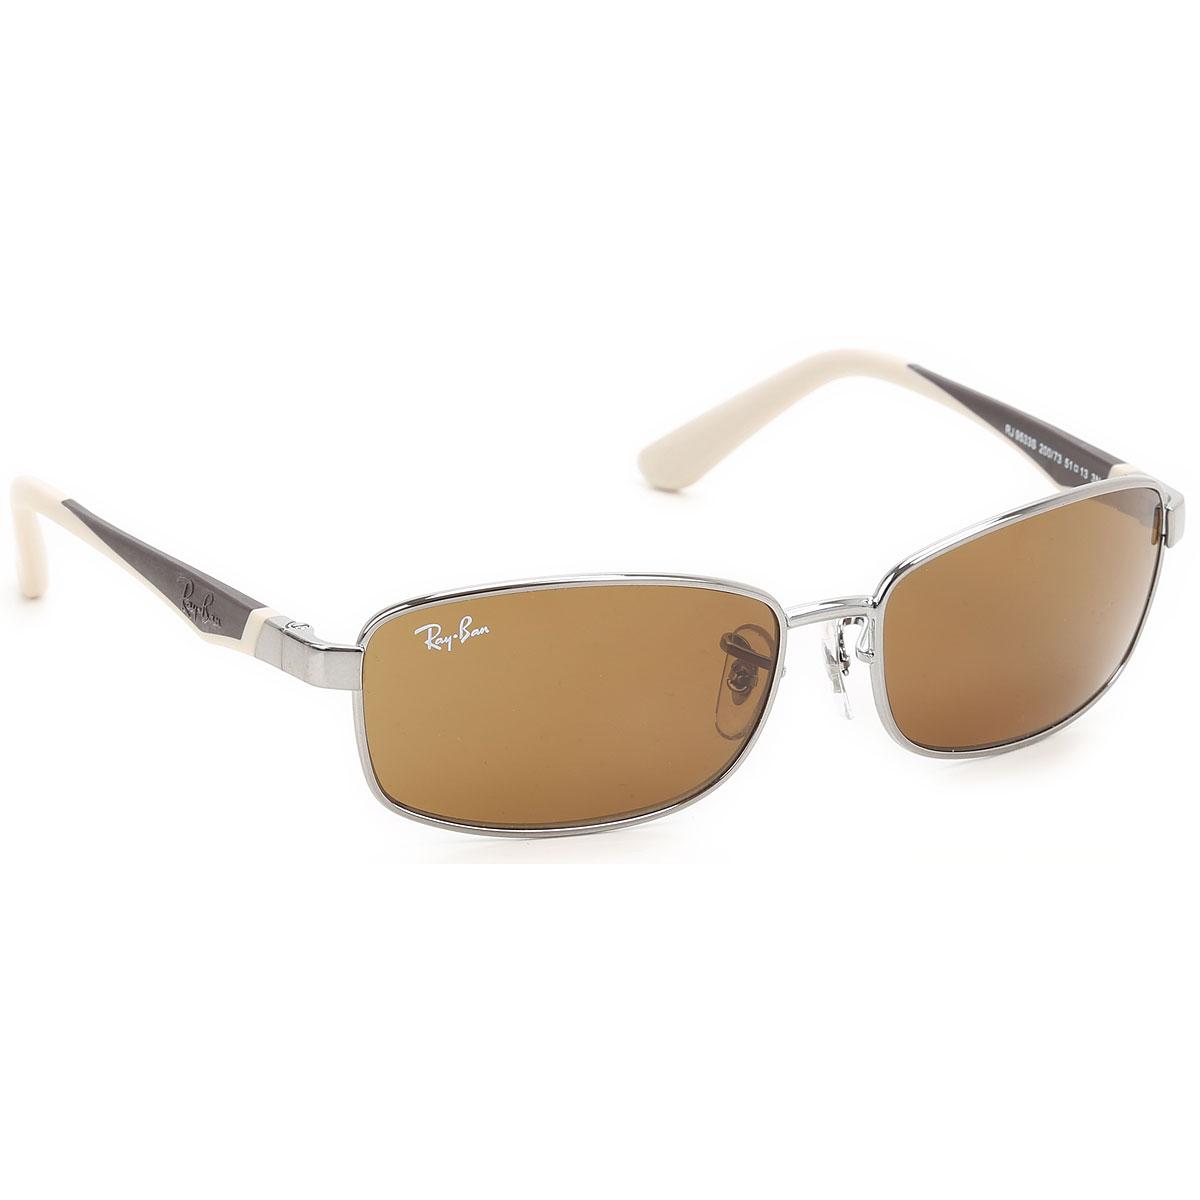 3cab01ad6b Ray Ban Sunglasses In Jalandhar « Heritage Malta